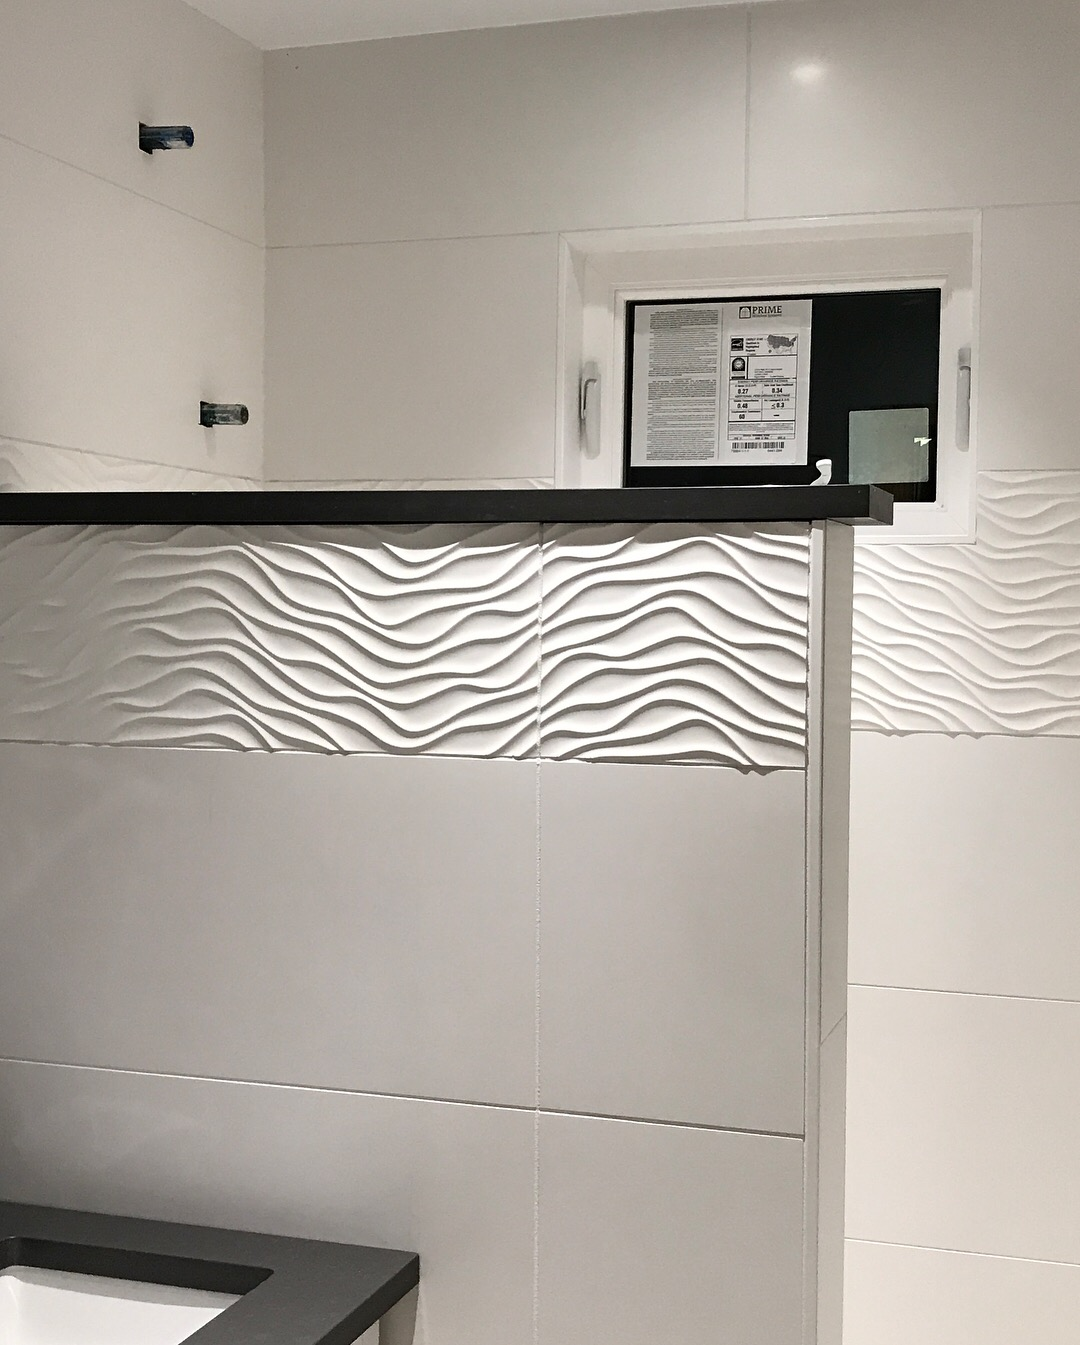 Help me out. Complete bathroom tiled.-836d815b-c2a2-42ed-b243-a64f4c923b99_1528155439238.jpeg